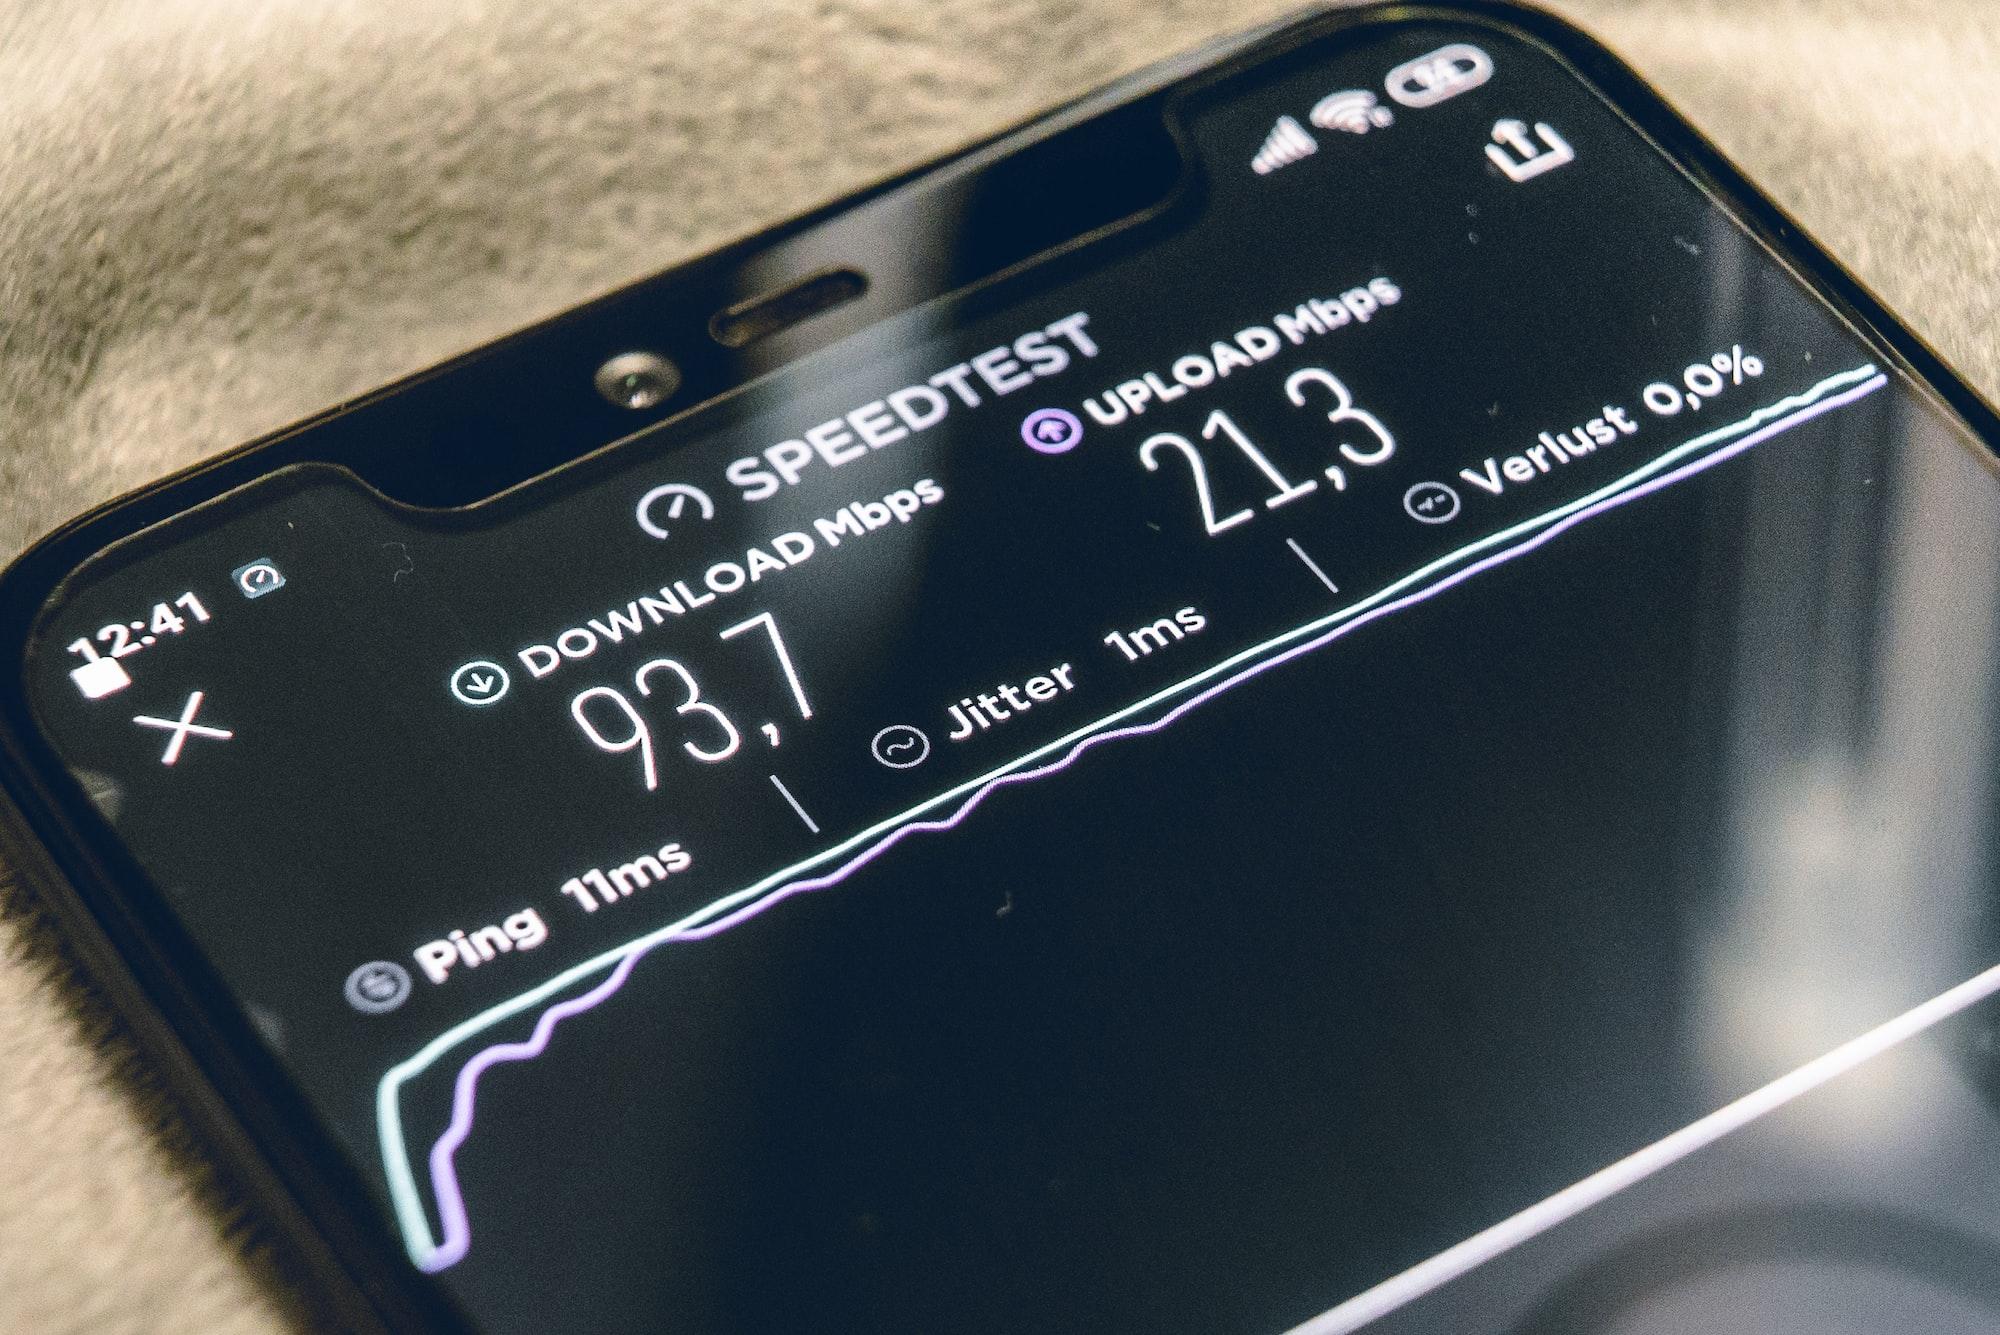 Why do you need Gigabit Internet?